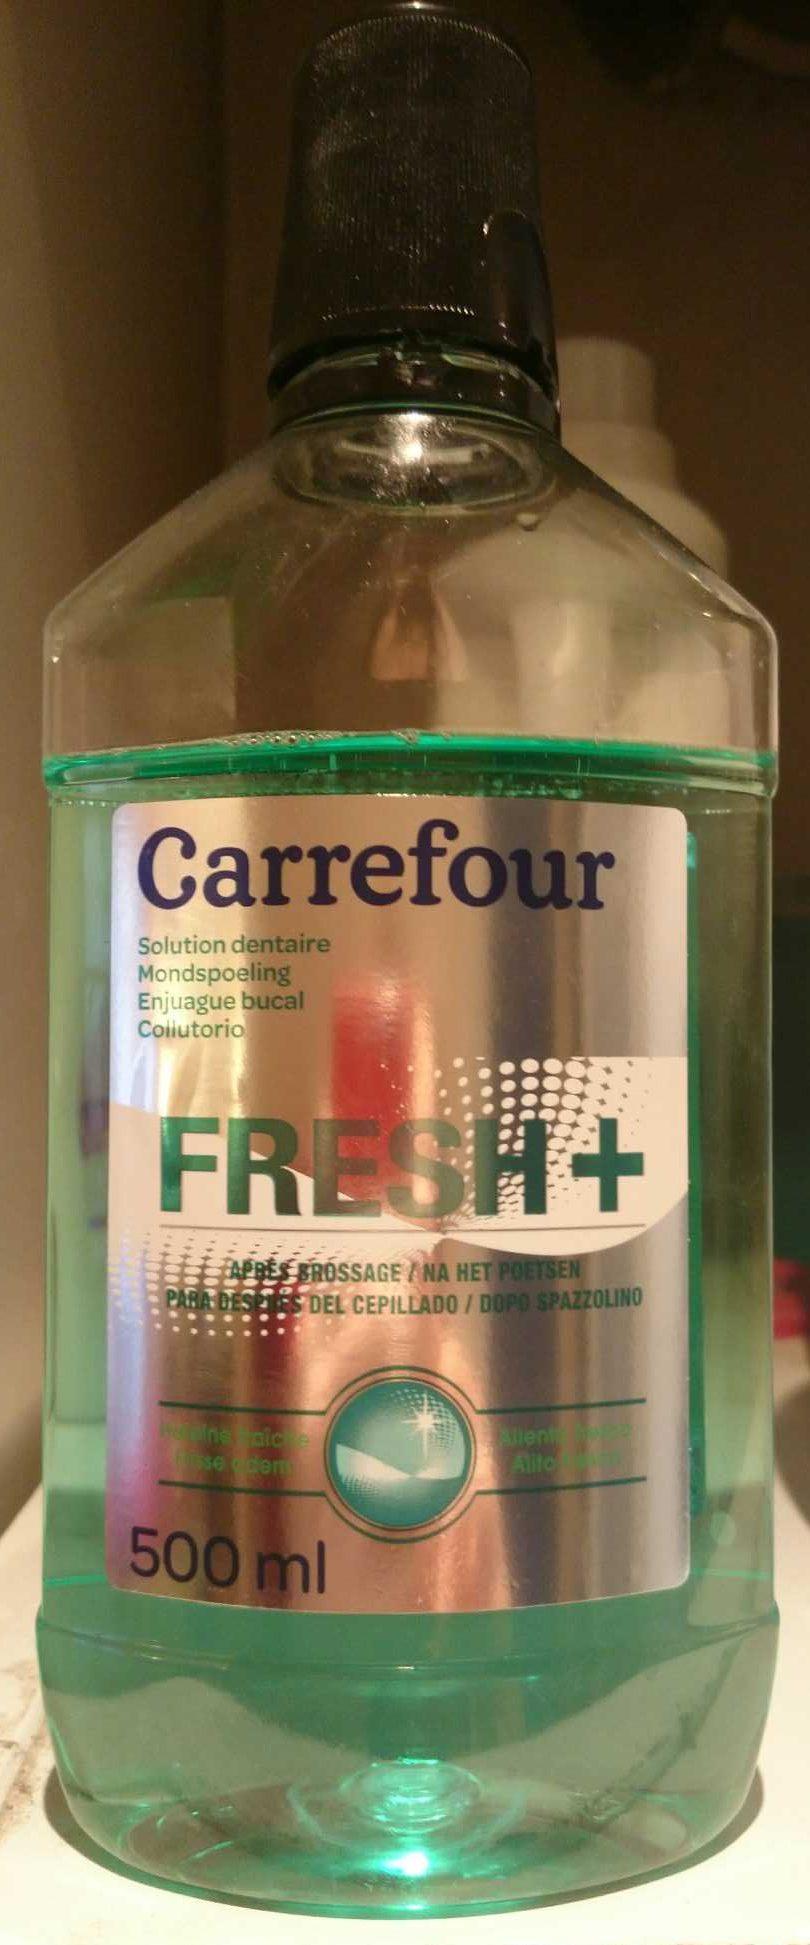 Fresh + - Product - en